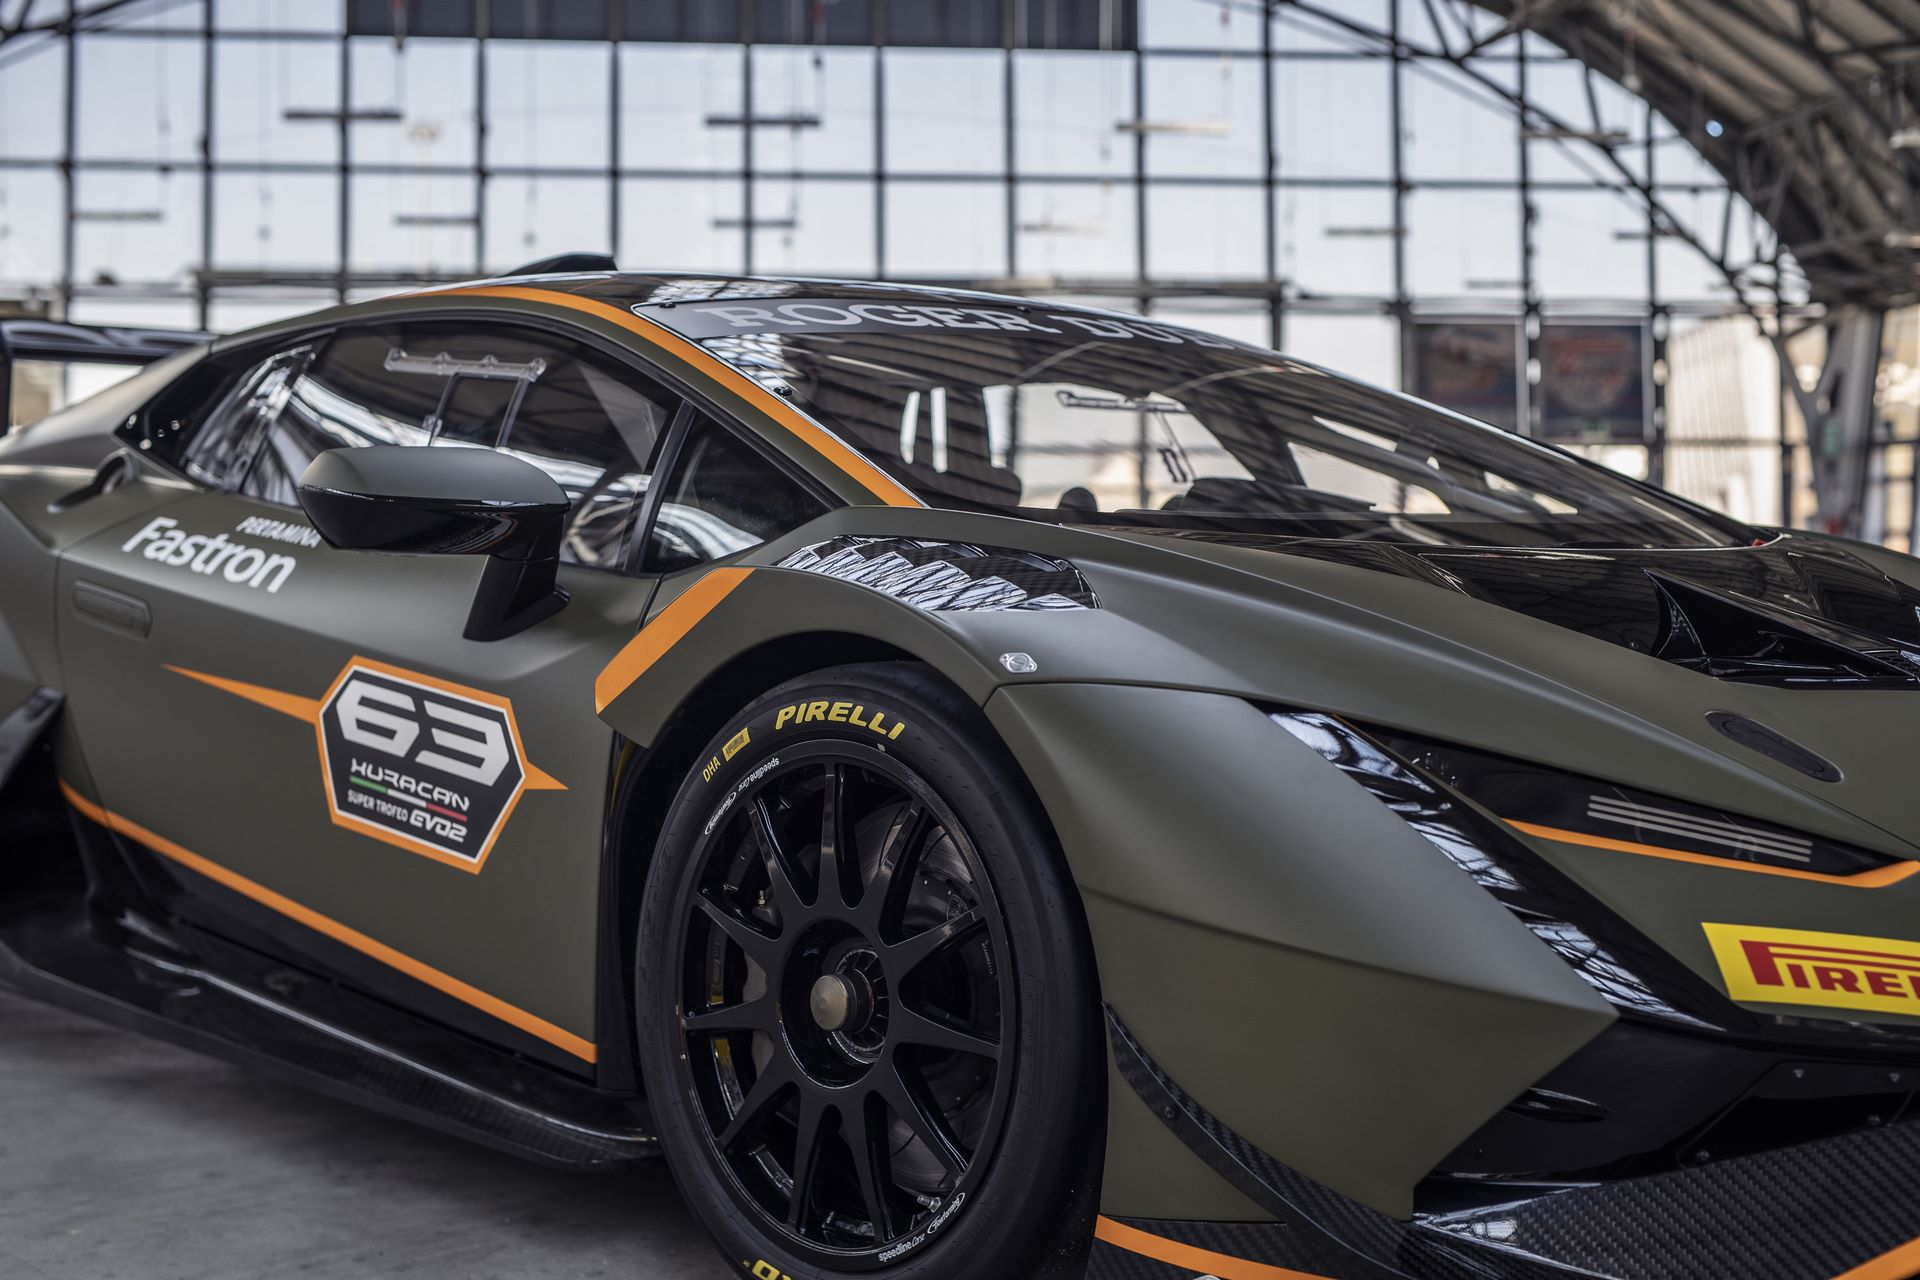 Lamborghini-Huracan-Super-Trofeo-EVO2-18